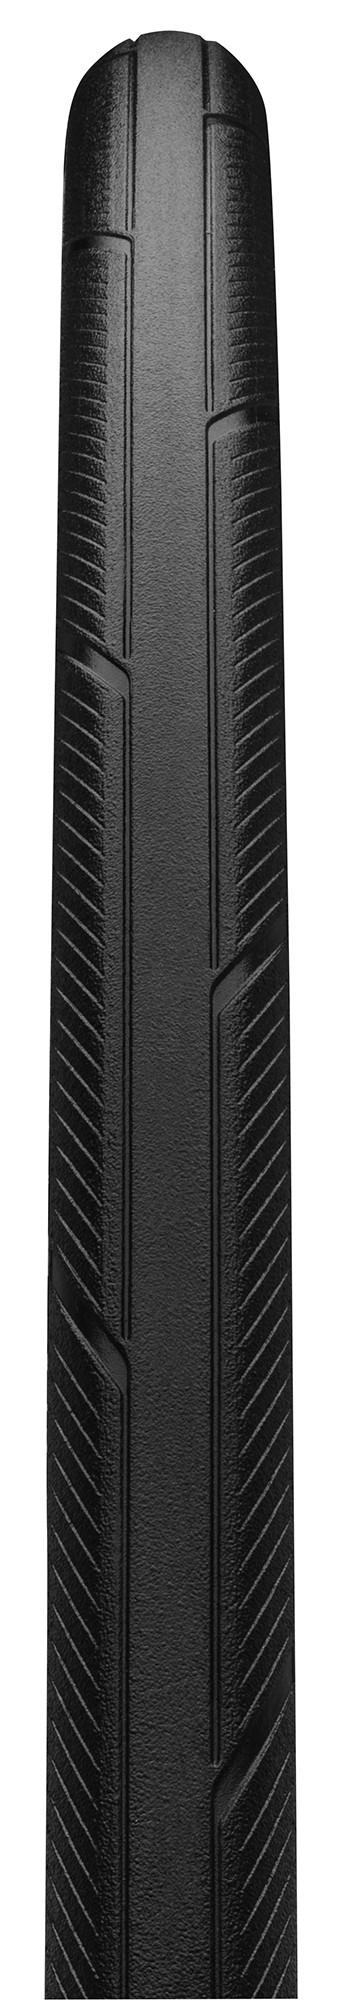 Anvelopa Continental UltraSport III 25-622 negru/negru - Wheelsports